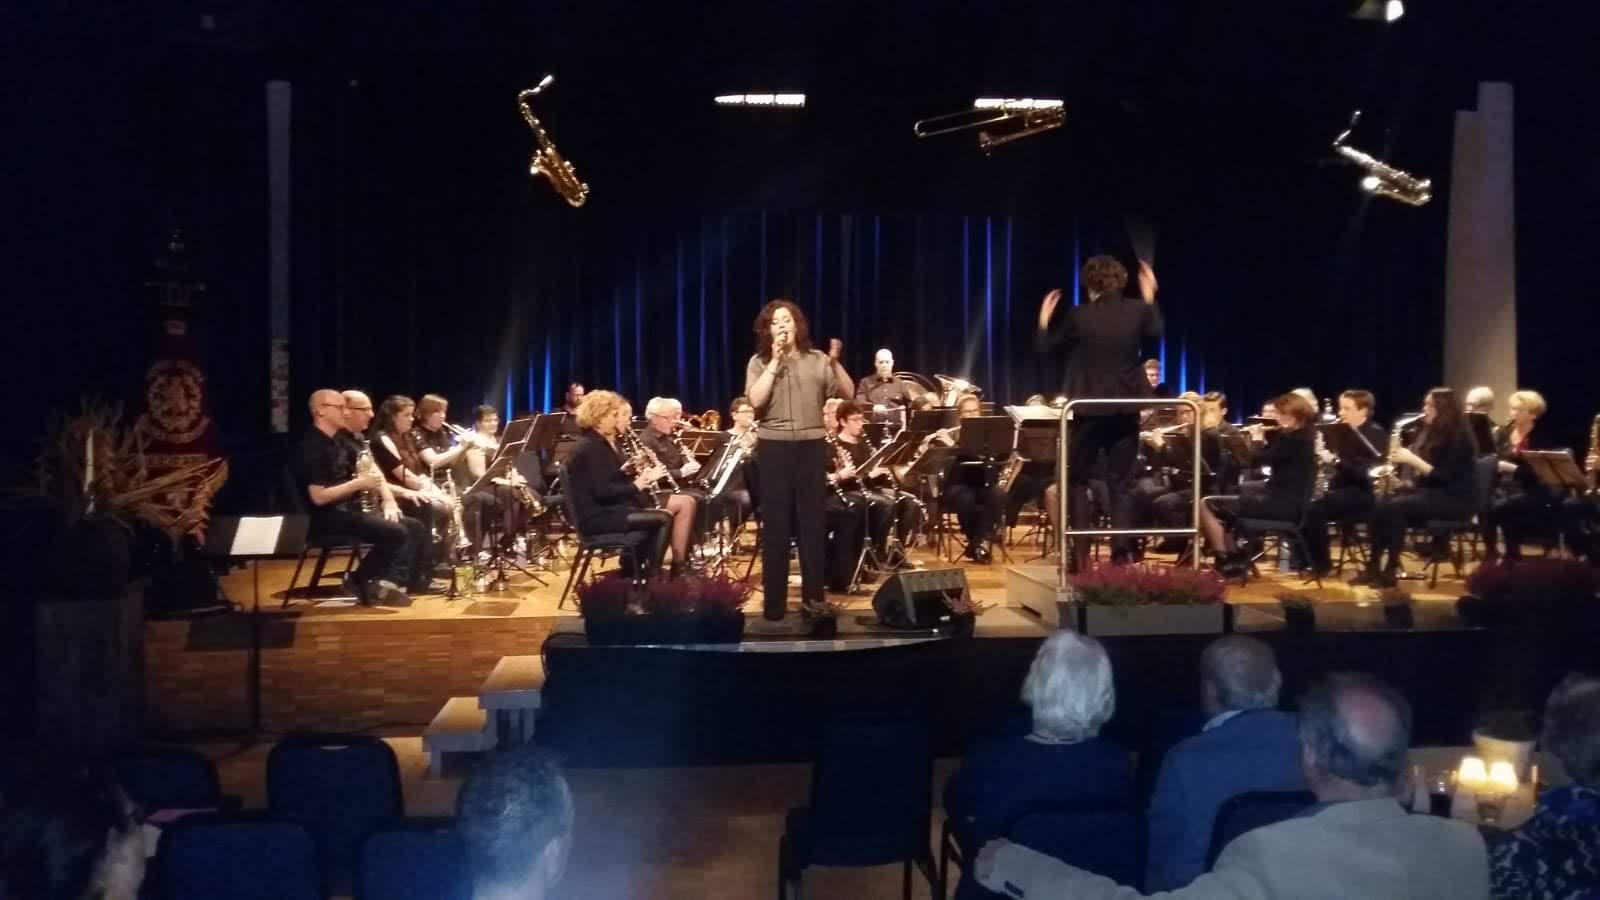 Harmonie-orkest